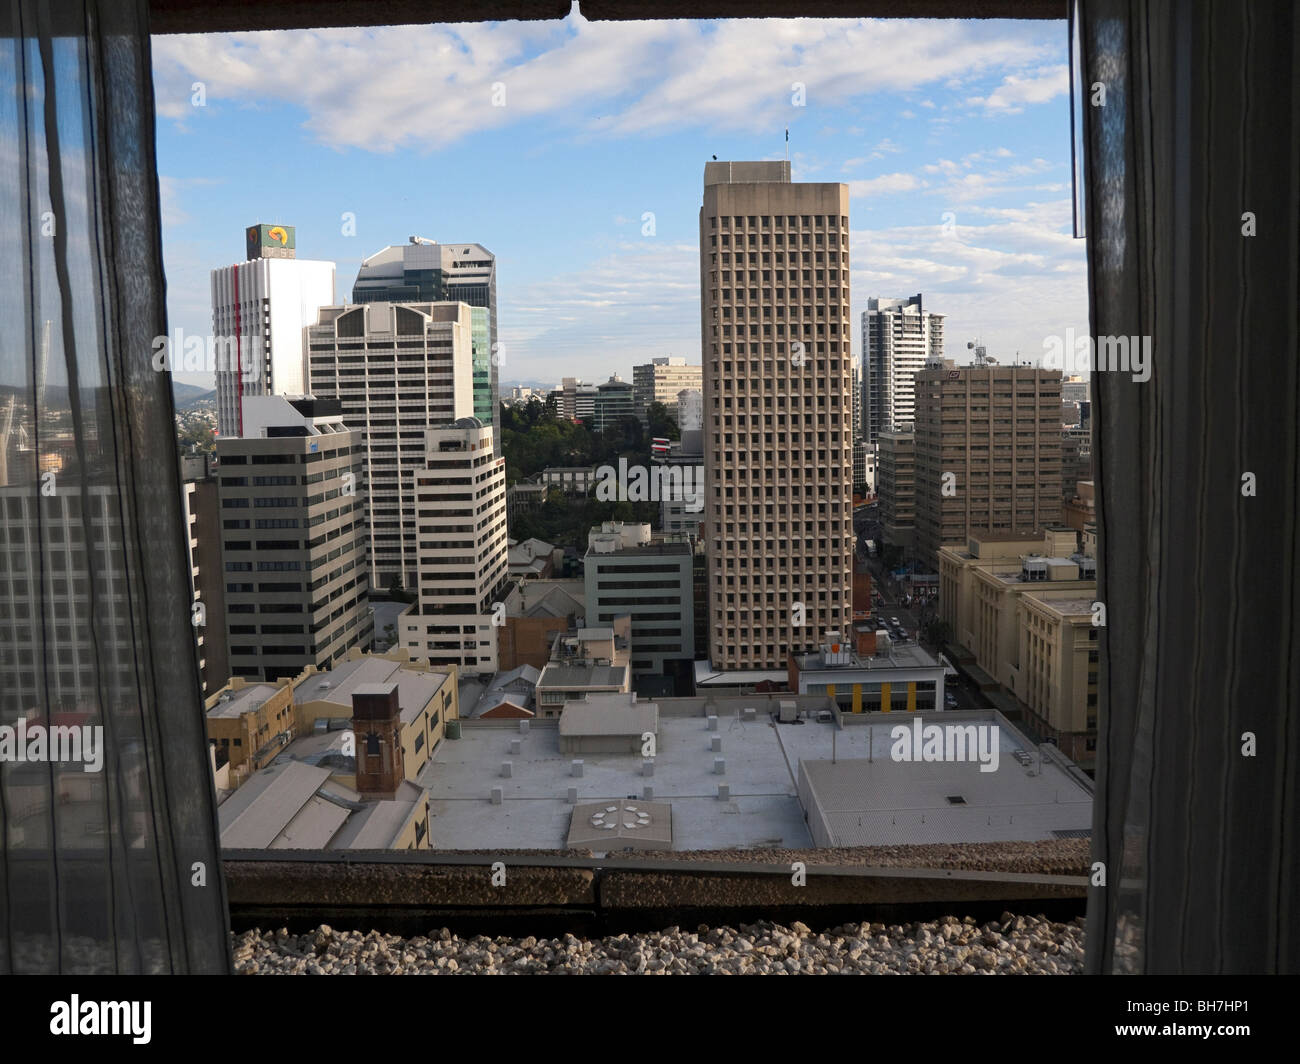 Brisbane Skyline from a Hotel Room in the Hilton on Elizabeth Street, Brisbane, Australia - Stock Image